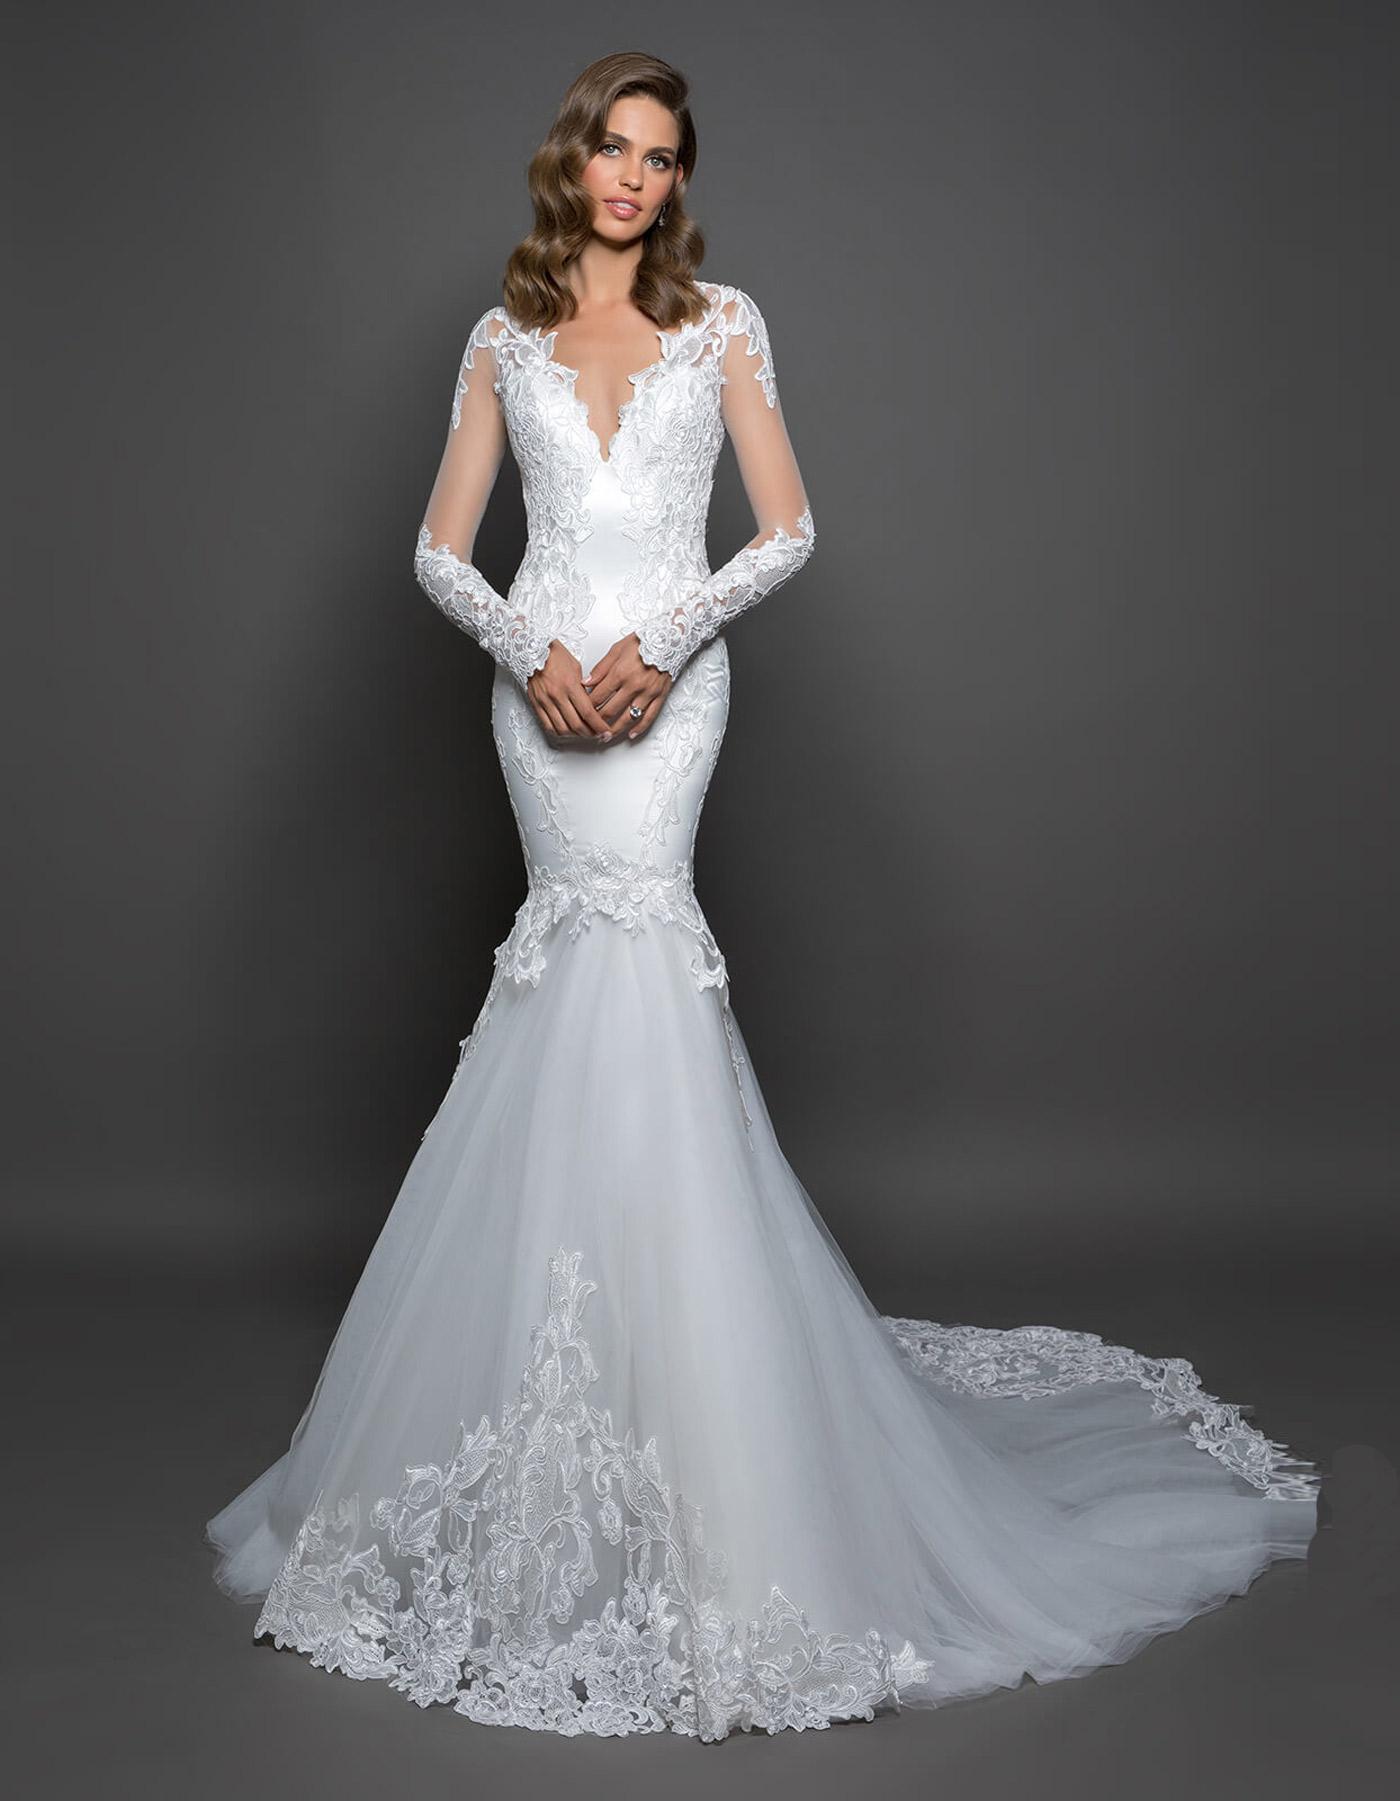 pnina tornai lace wedding dresses photo - 1